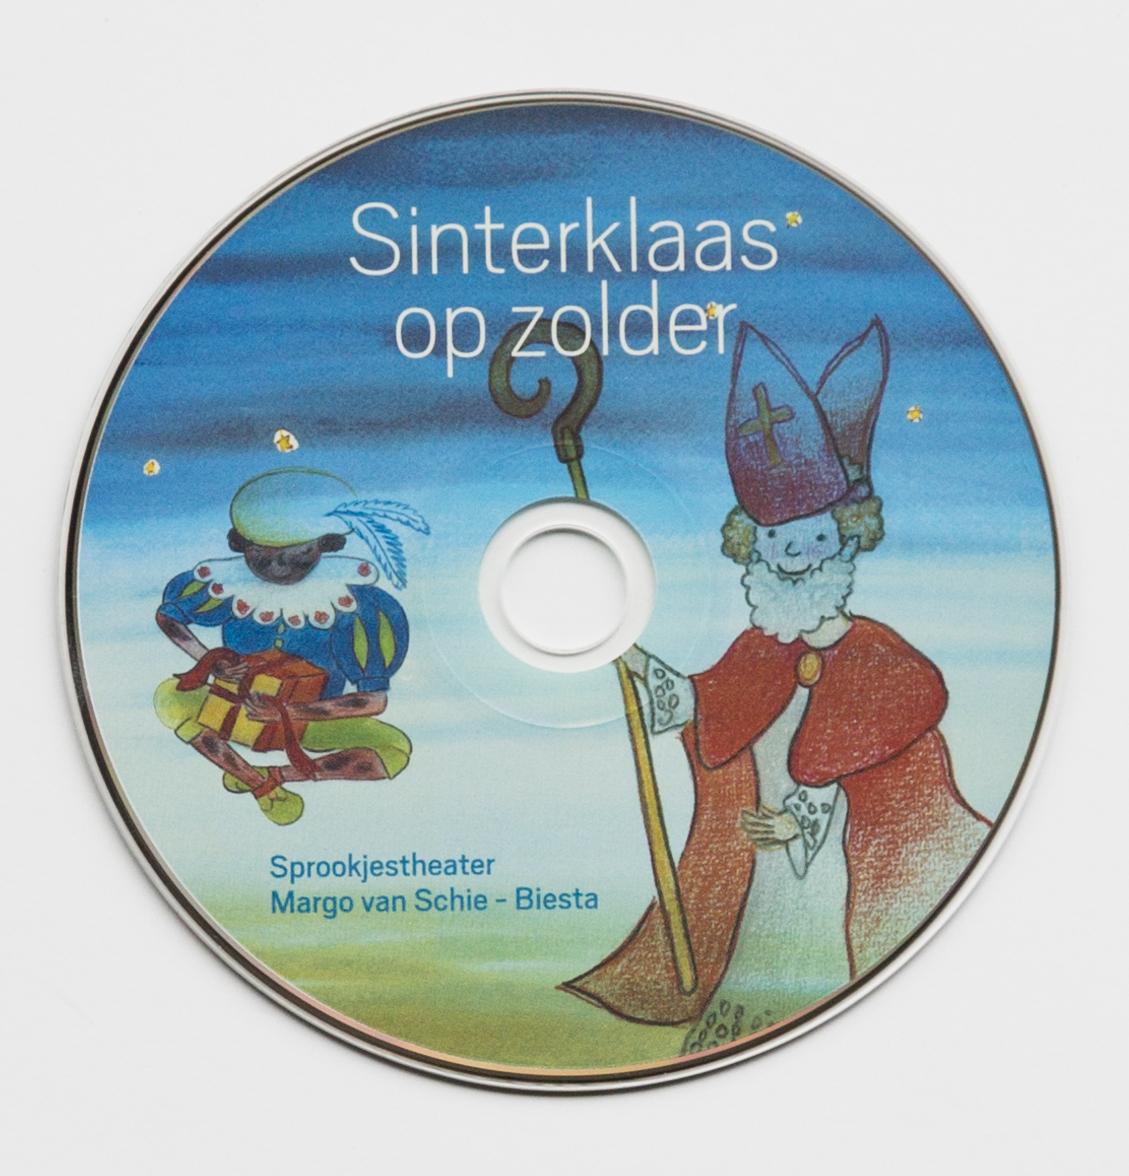 Sinterklaas-CD_79A8814.jpg